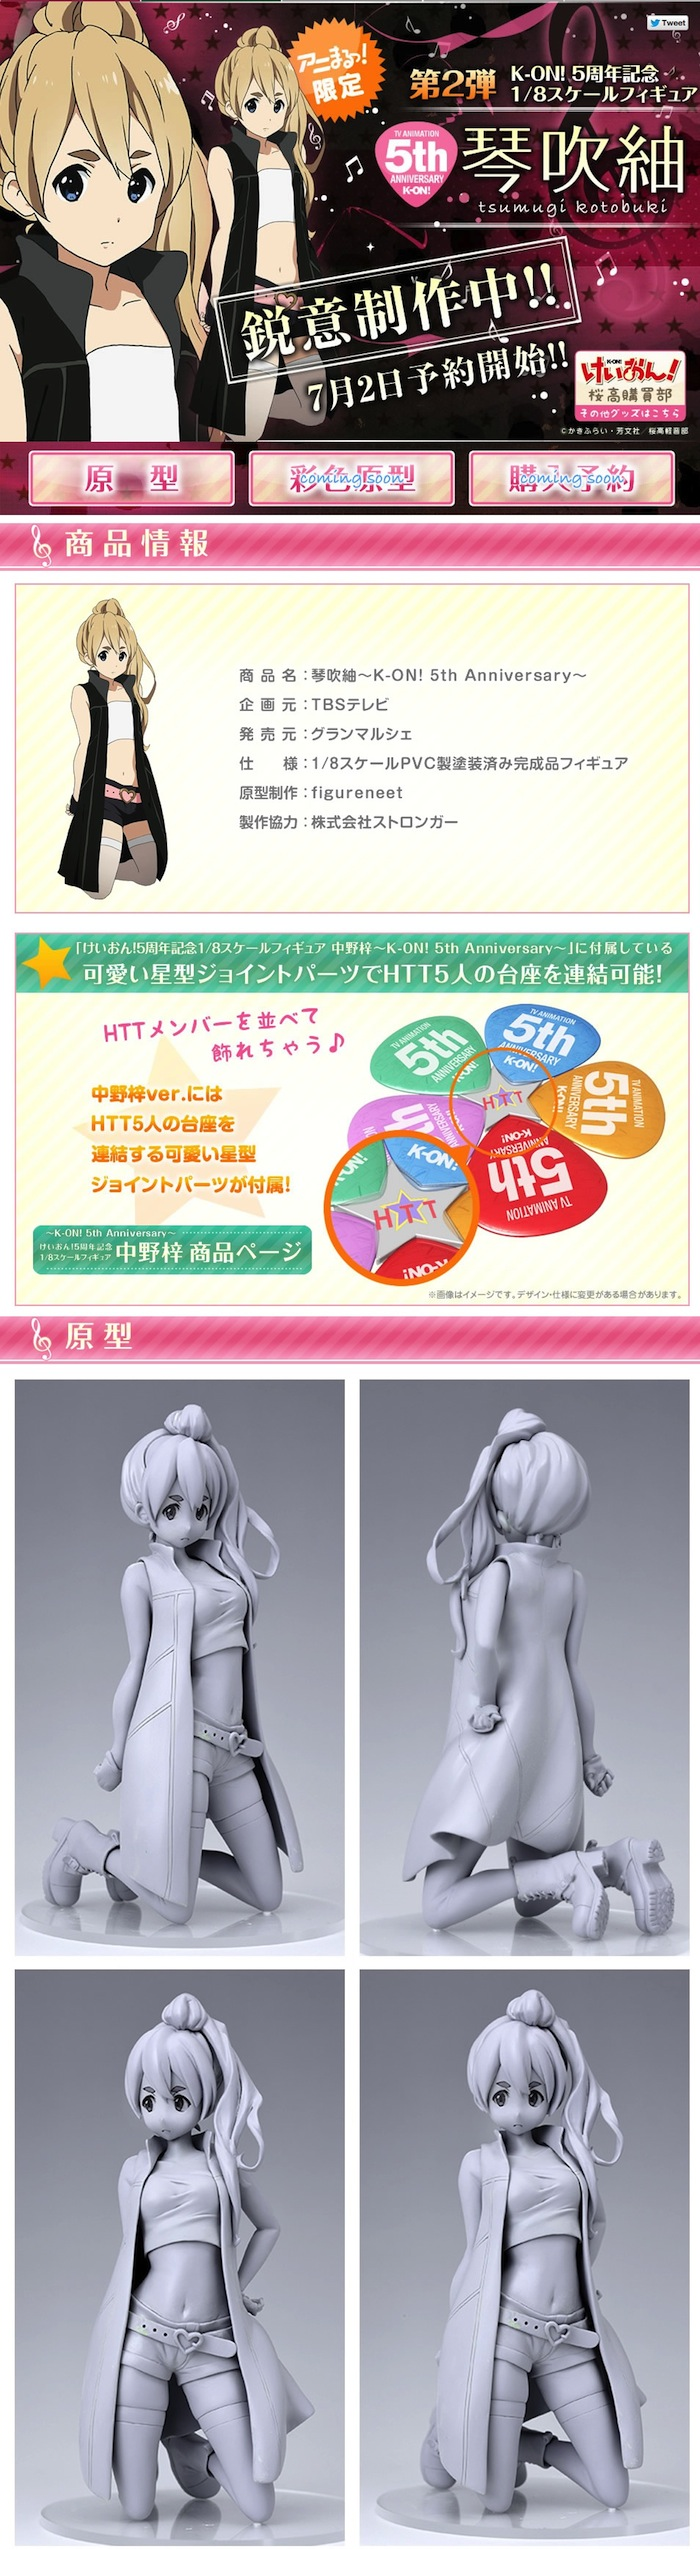 screencapture-animaru-jp-shop-pages-k-on_figure_tsumugi-aspx-1435375340019 のコピー